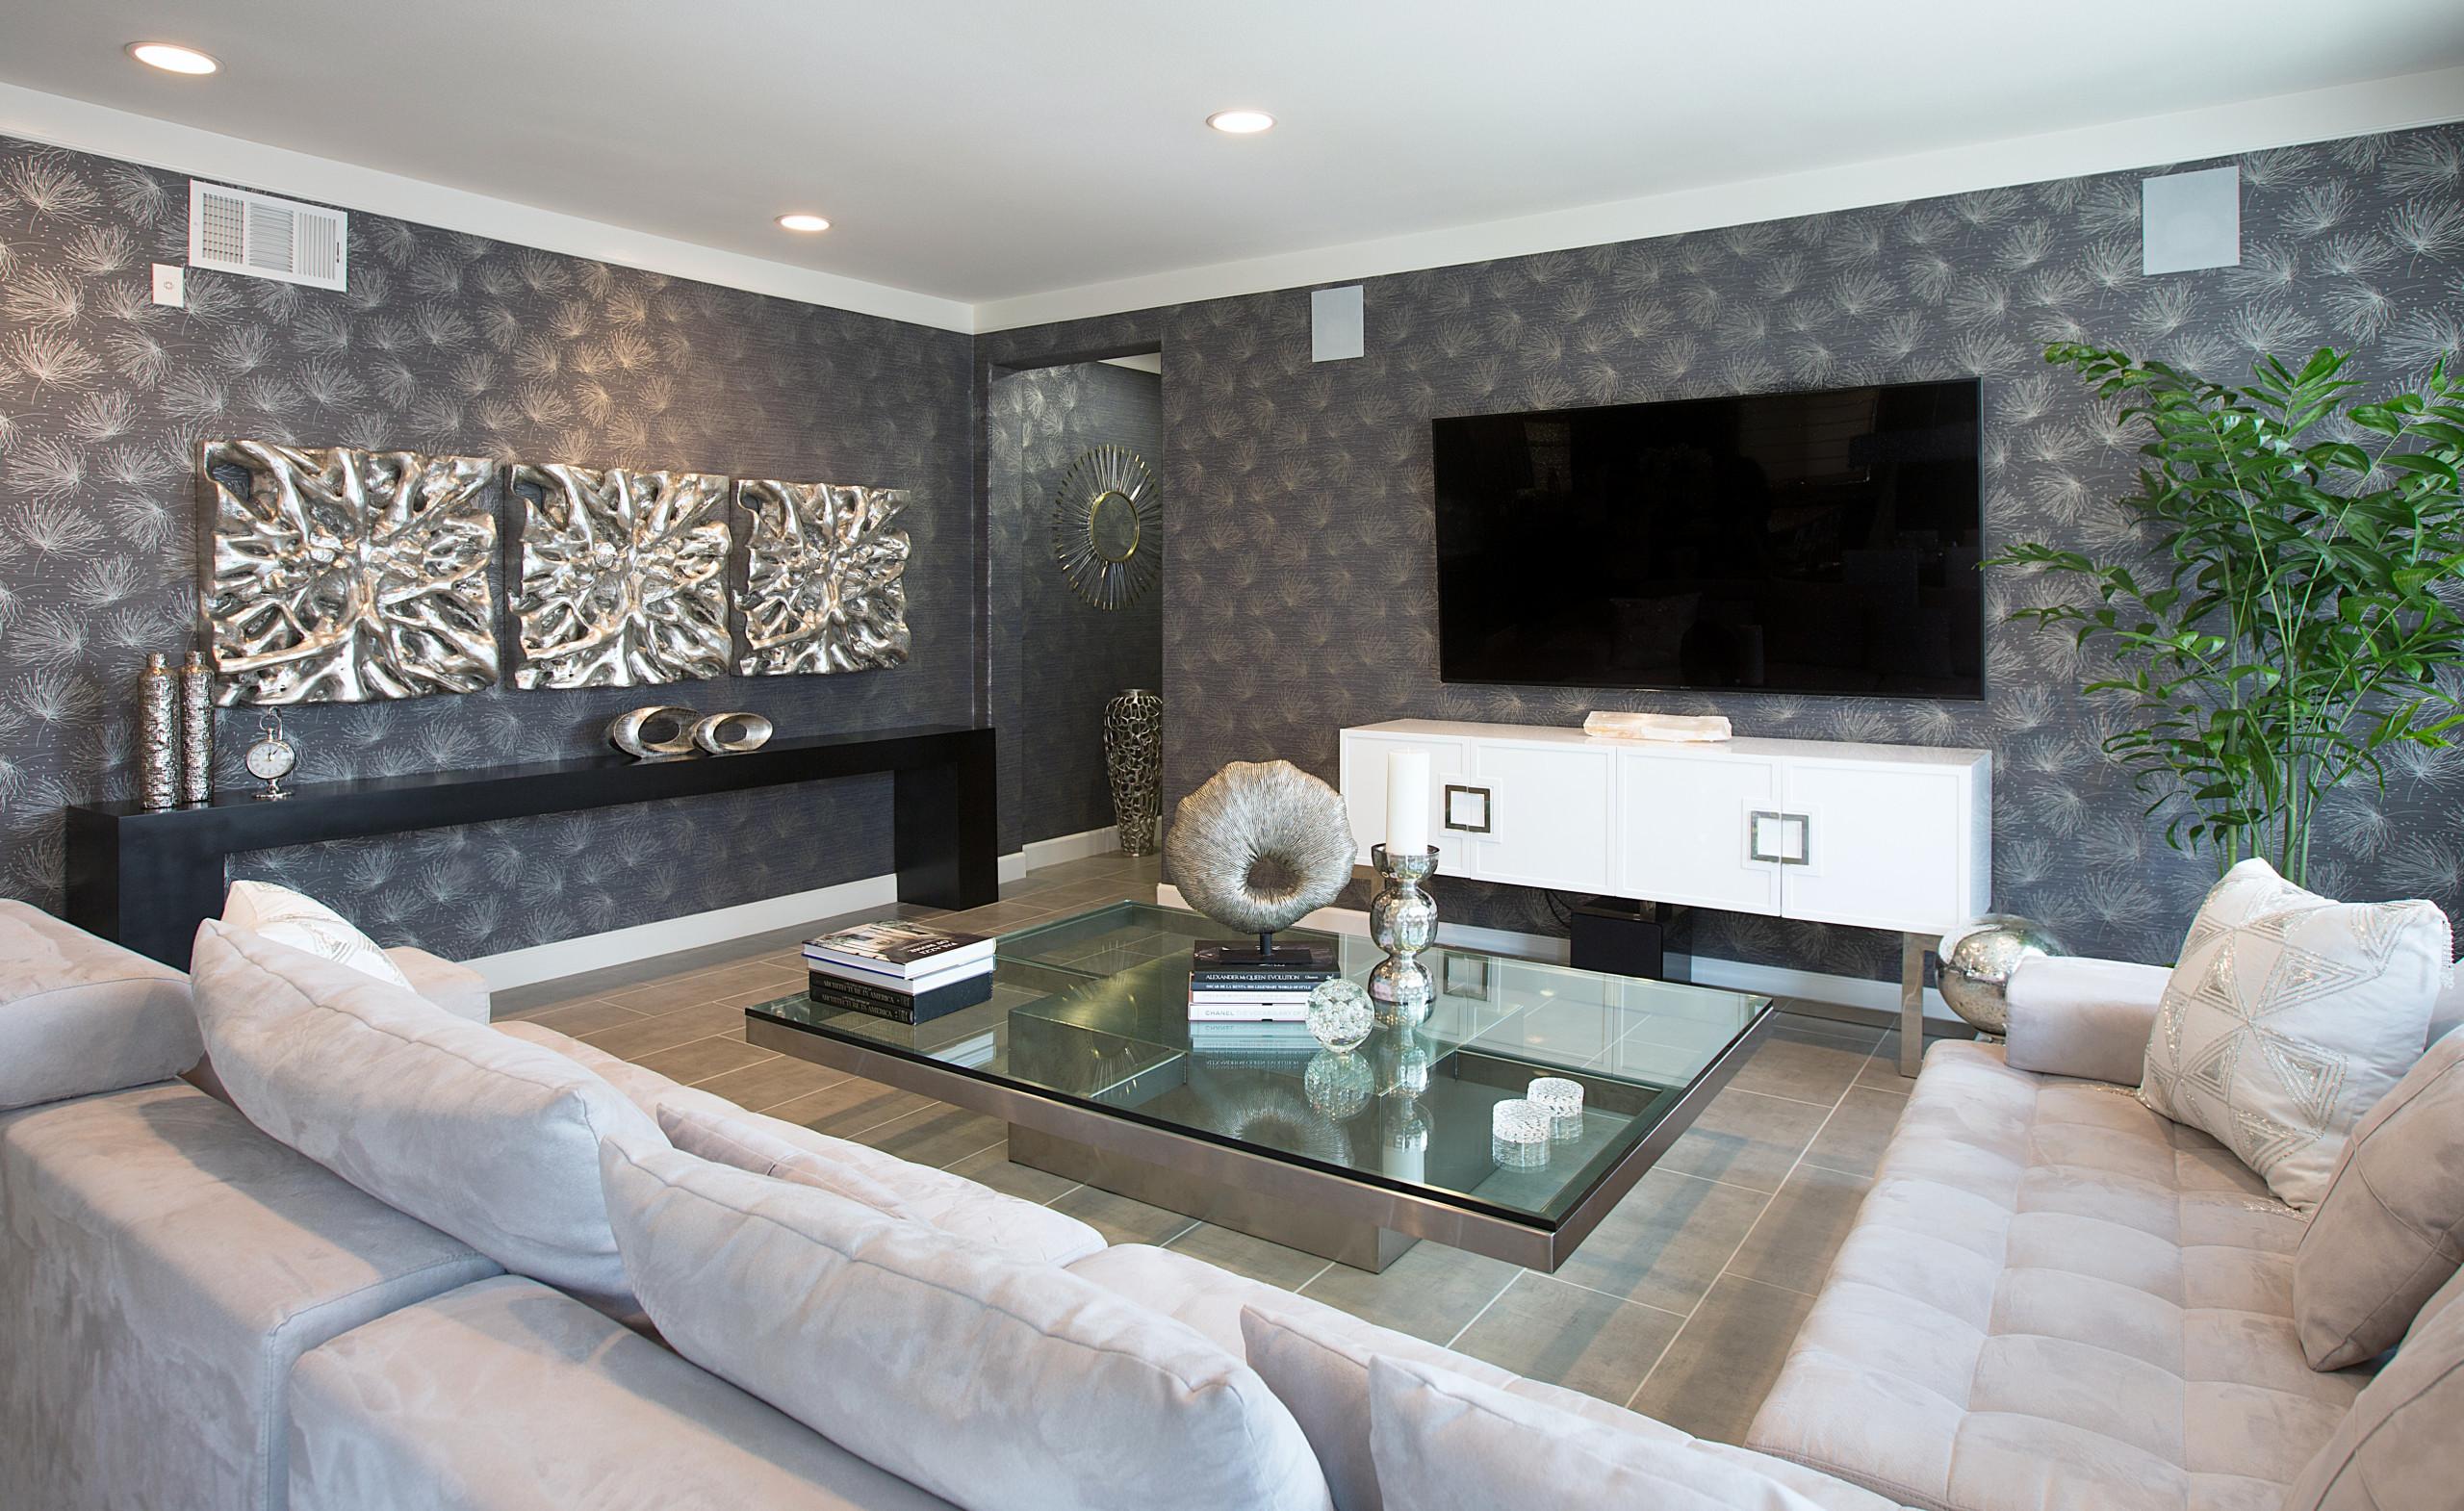 Contemporary Design - Playa Vista California